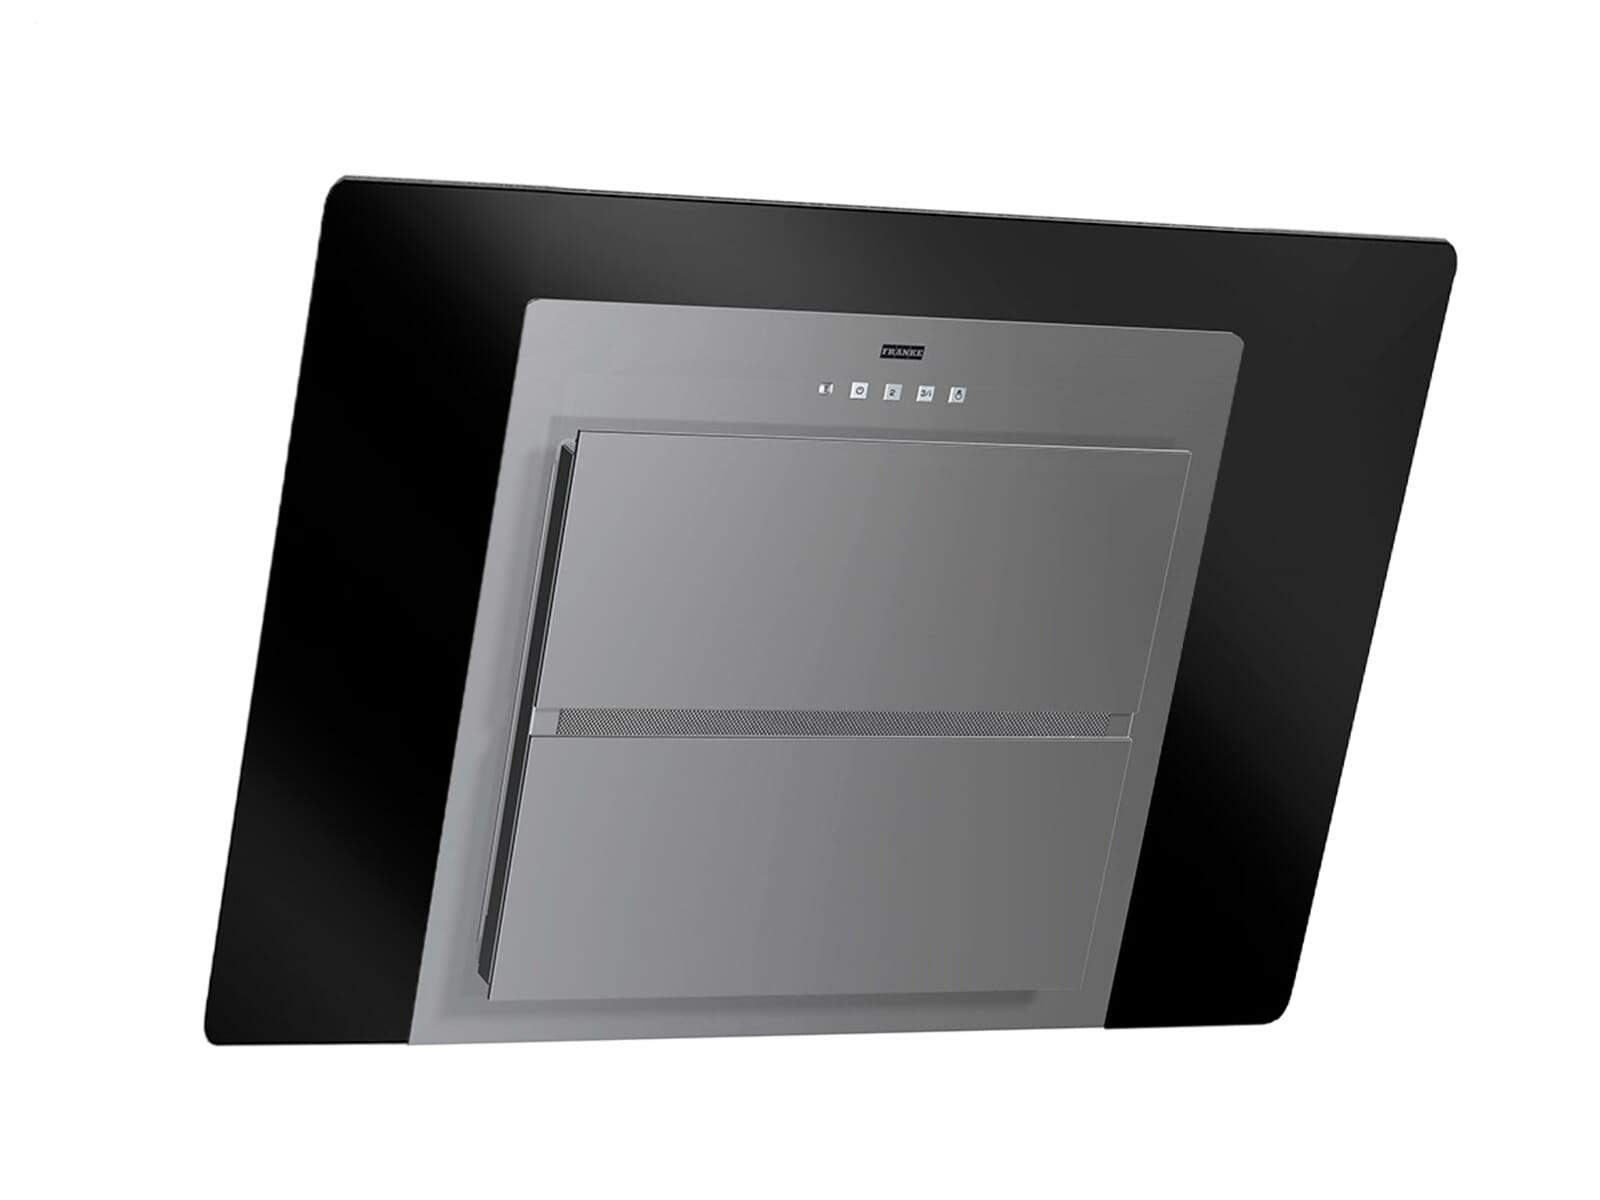 franke fusion ffu 605 bk xs kopffreihaube schwarz edelstahl wandesse dunstabzug. Black Bedroom Furniture Sets. Home Design Ideas